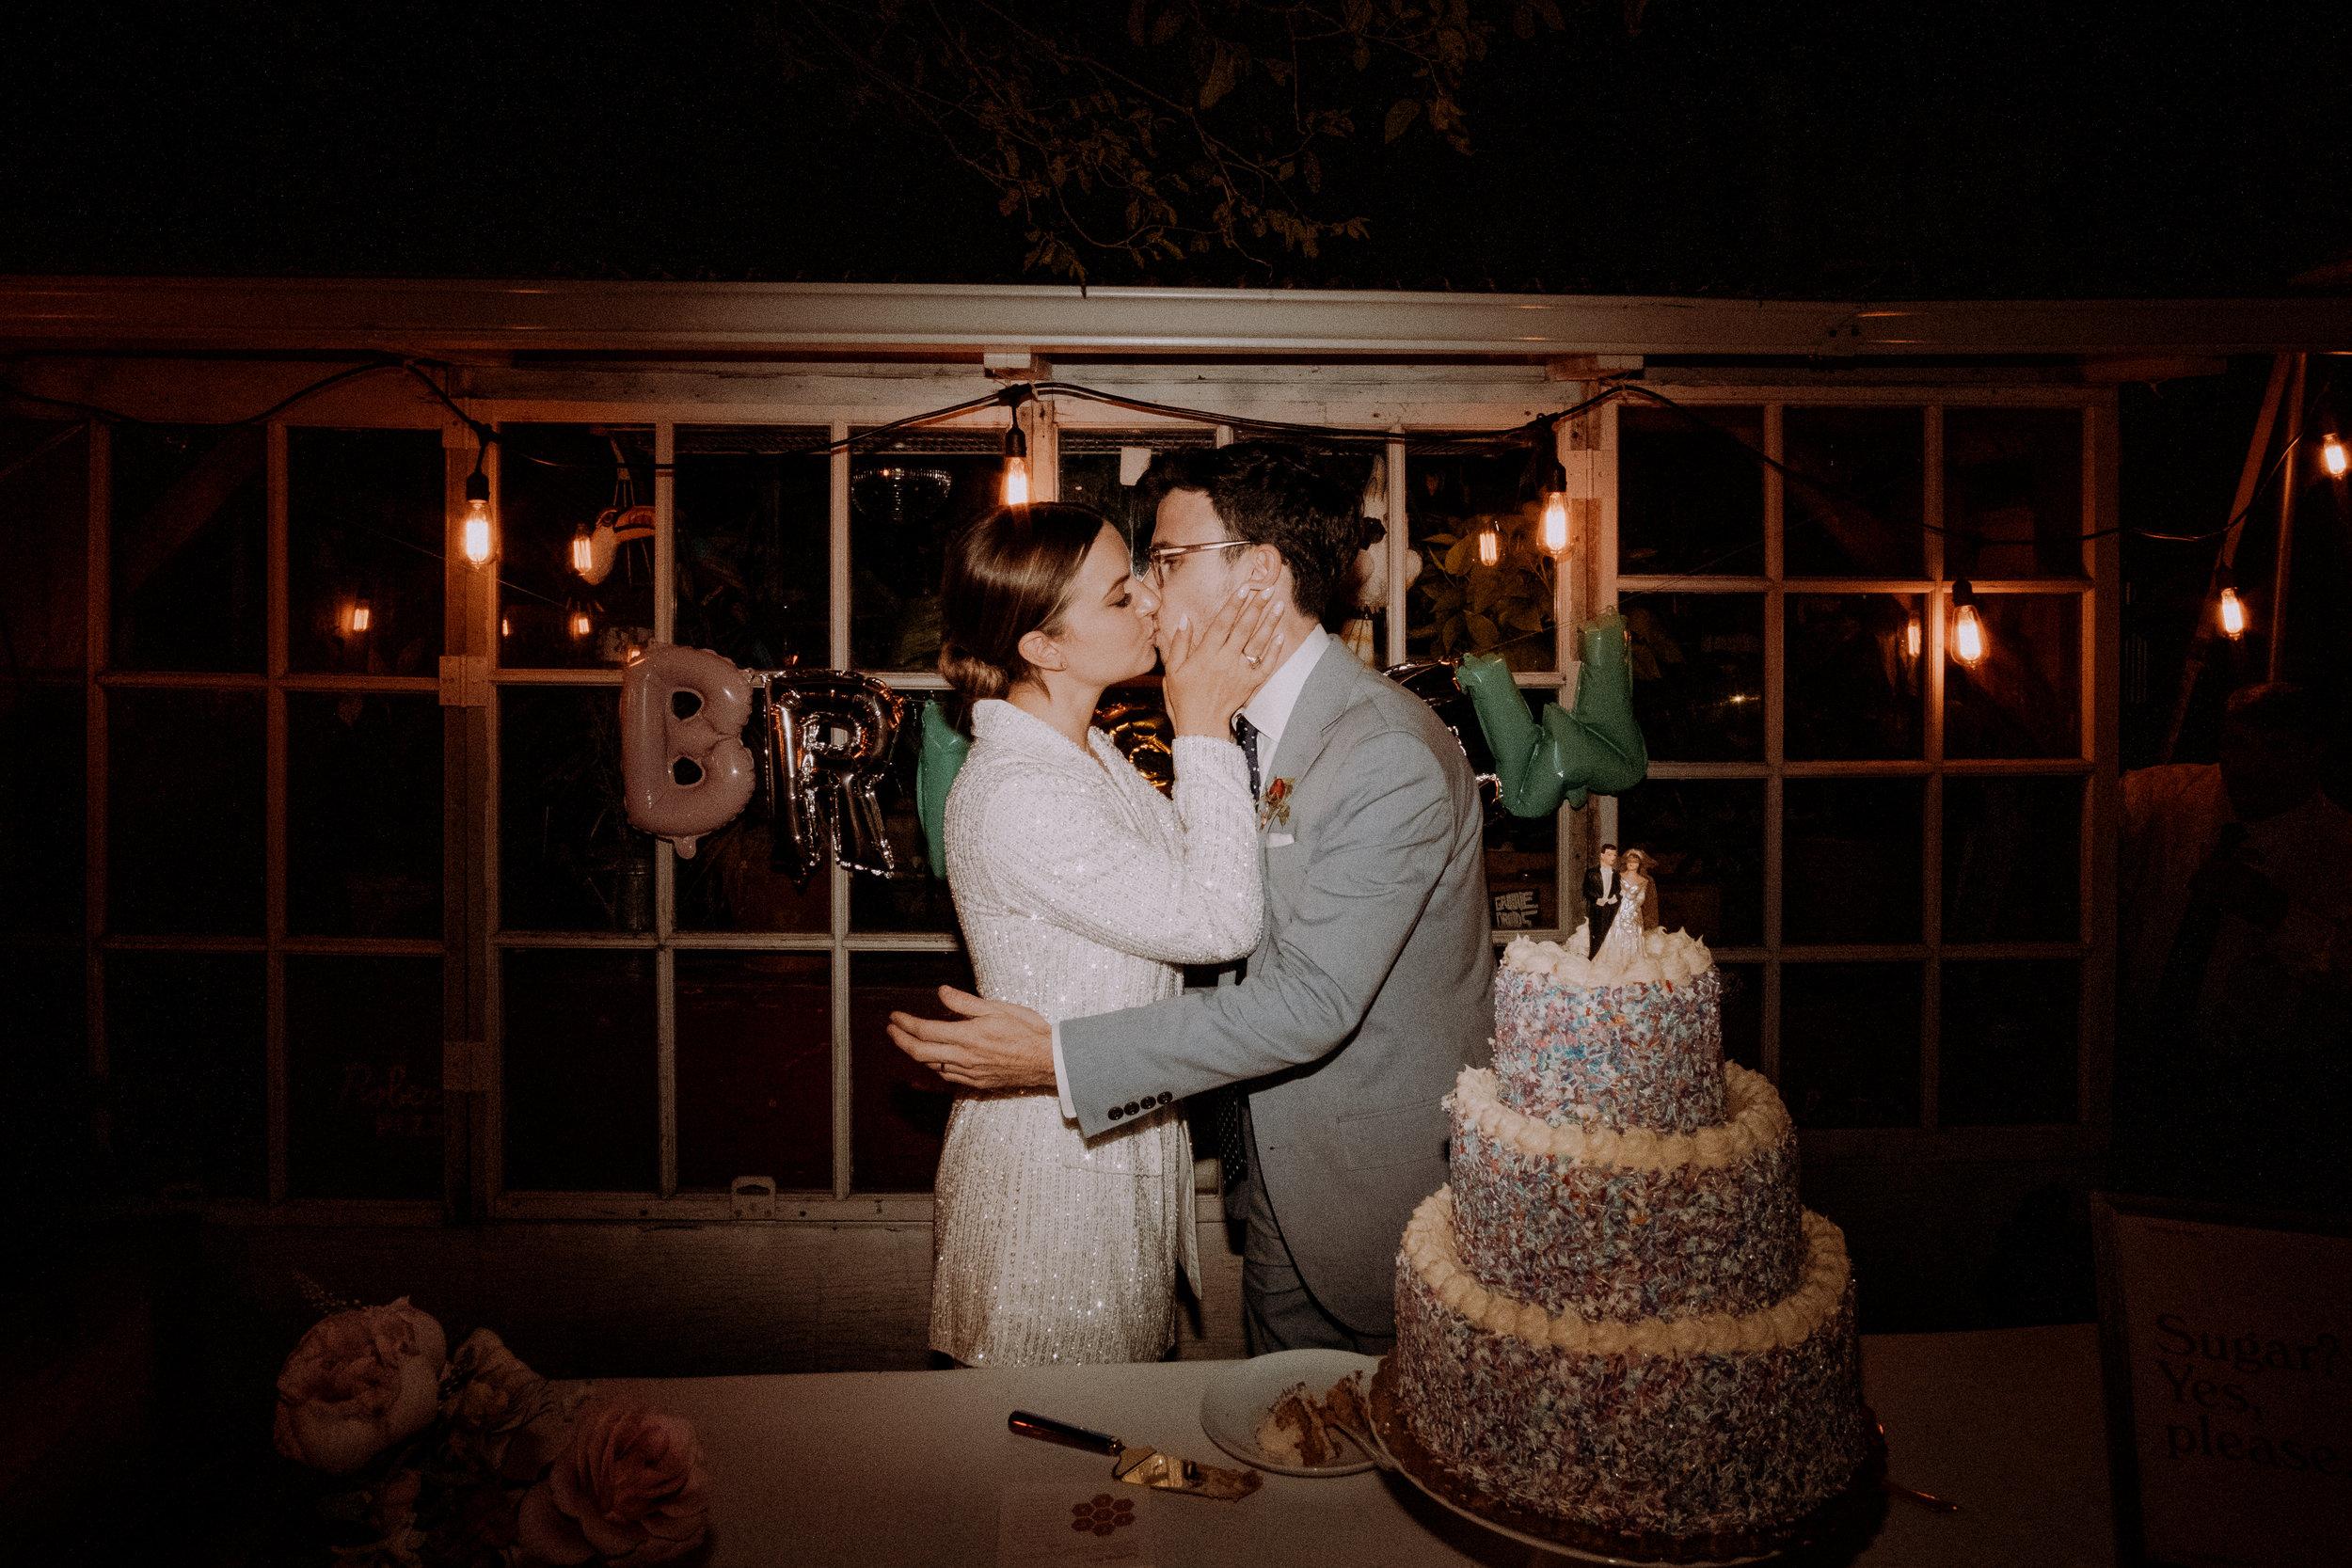 Chellise_Michael_Photography_Robertas_Brooklyn_Wedding_Photographer-831.jpg